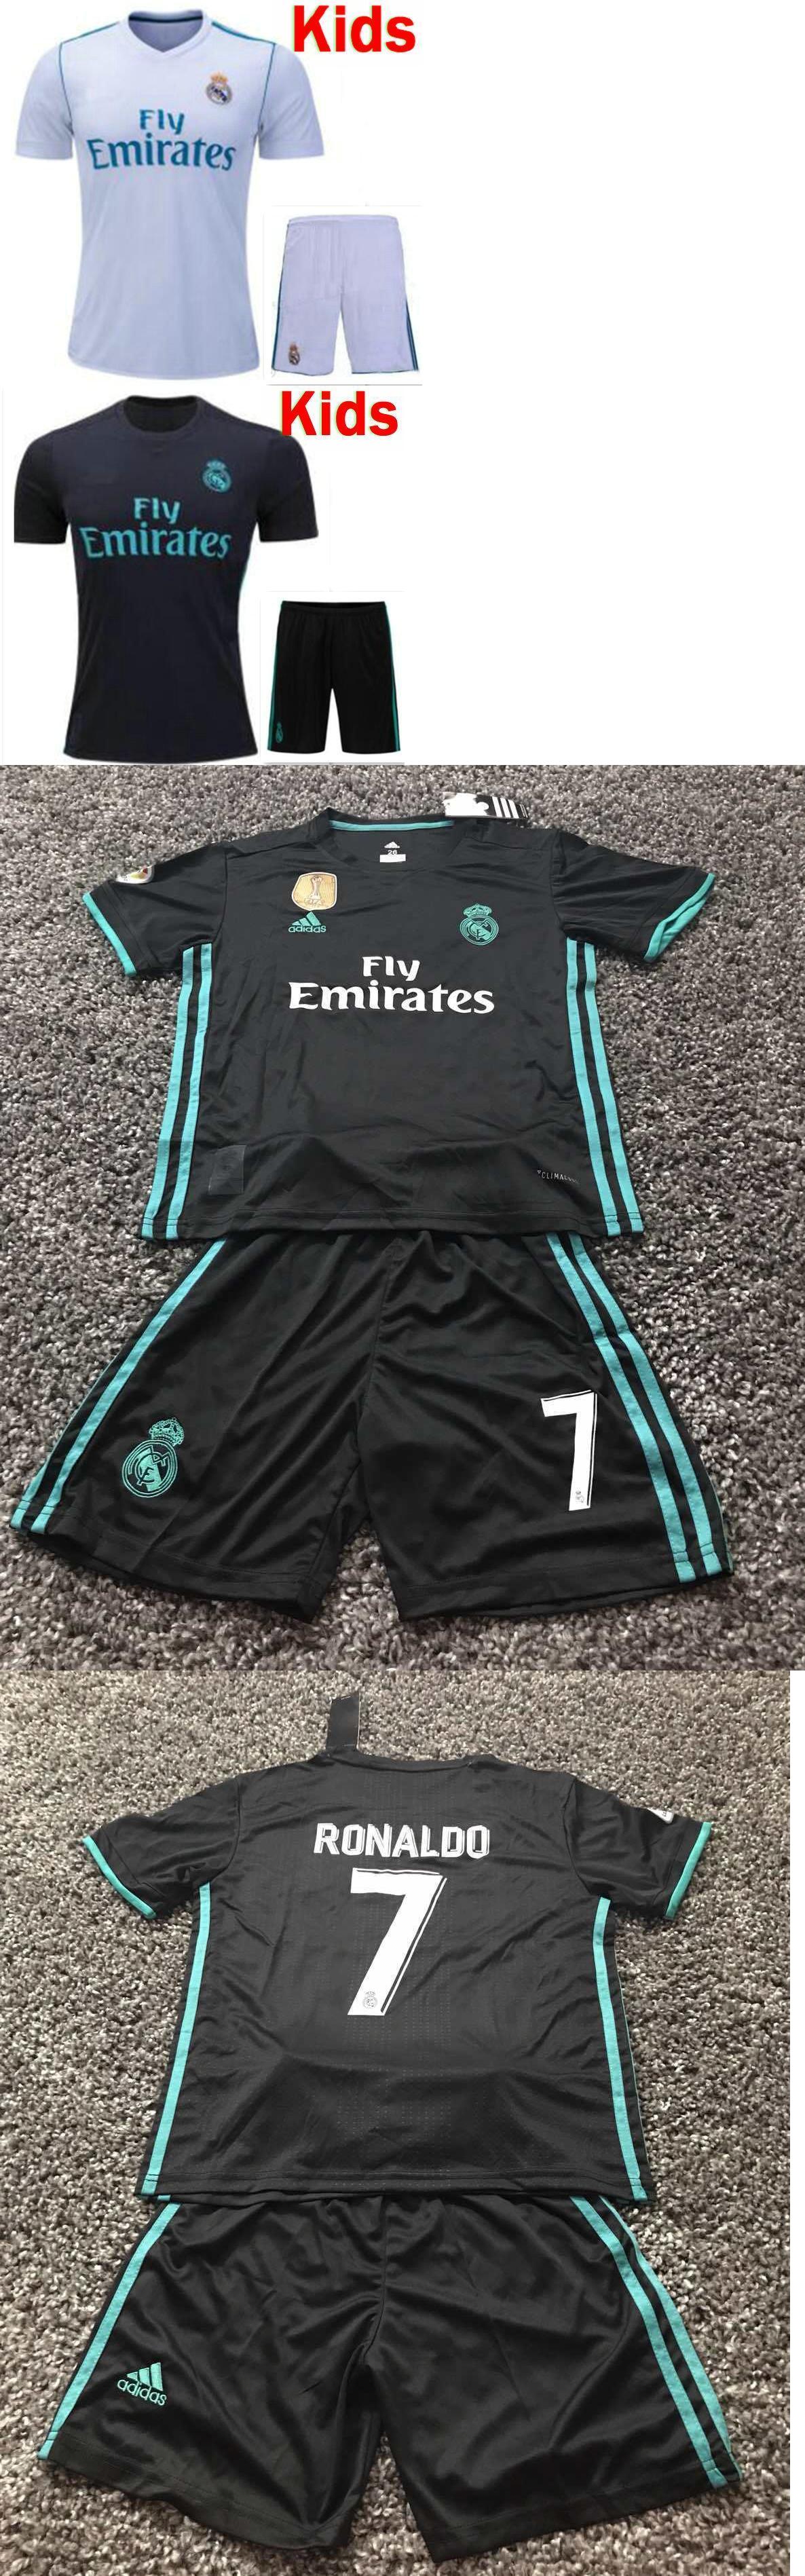 Youth 159099  2017-2018 Real Madrid Home And Away Jersey Ronaldo  7 Kids 2cbf5008f